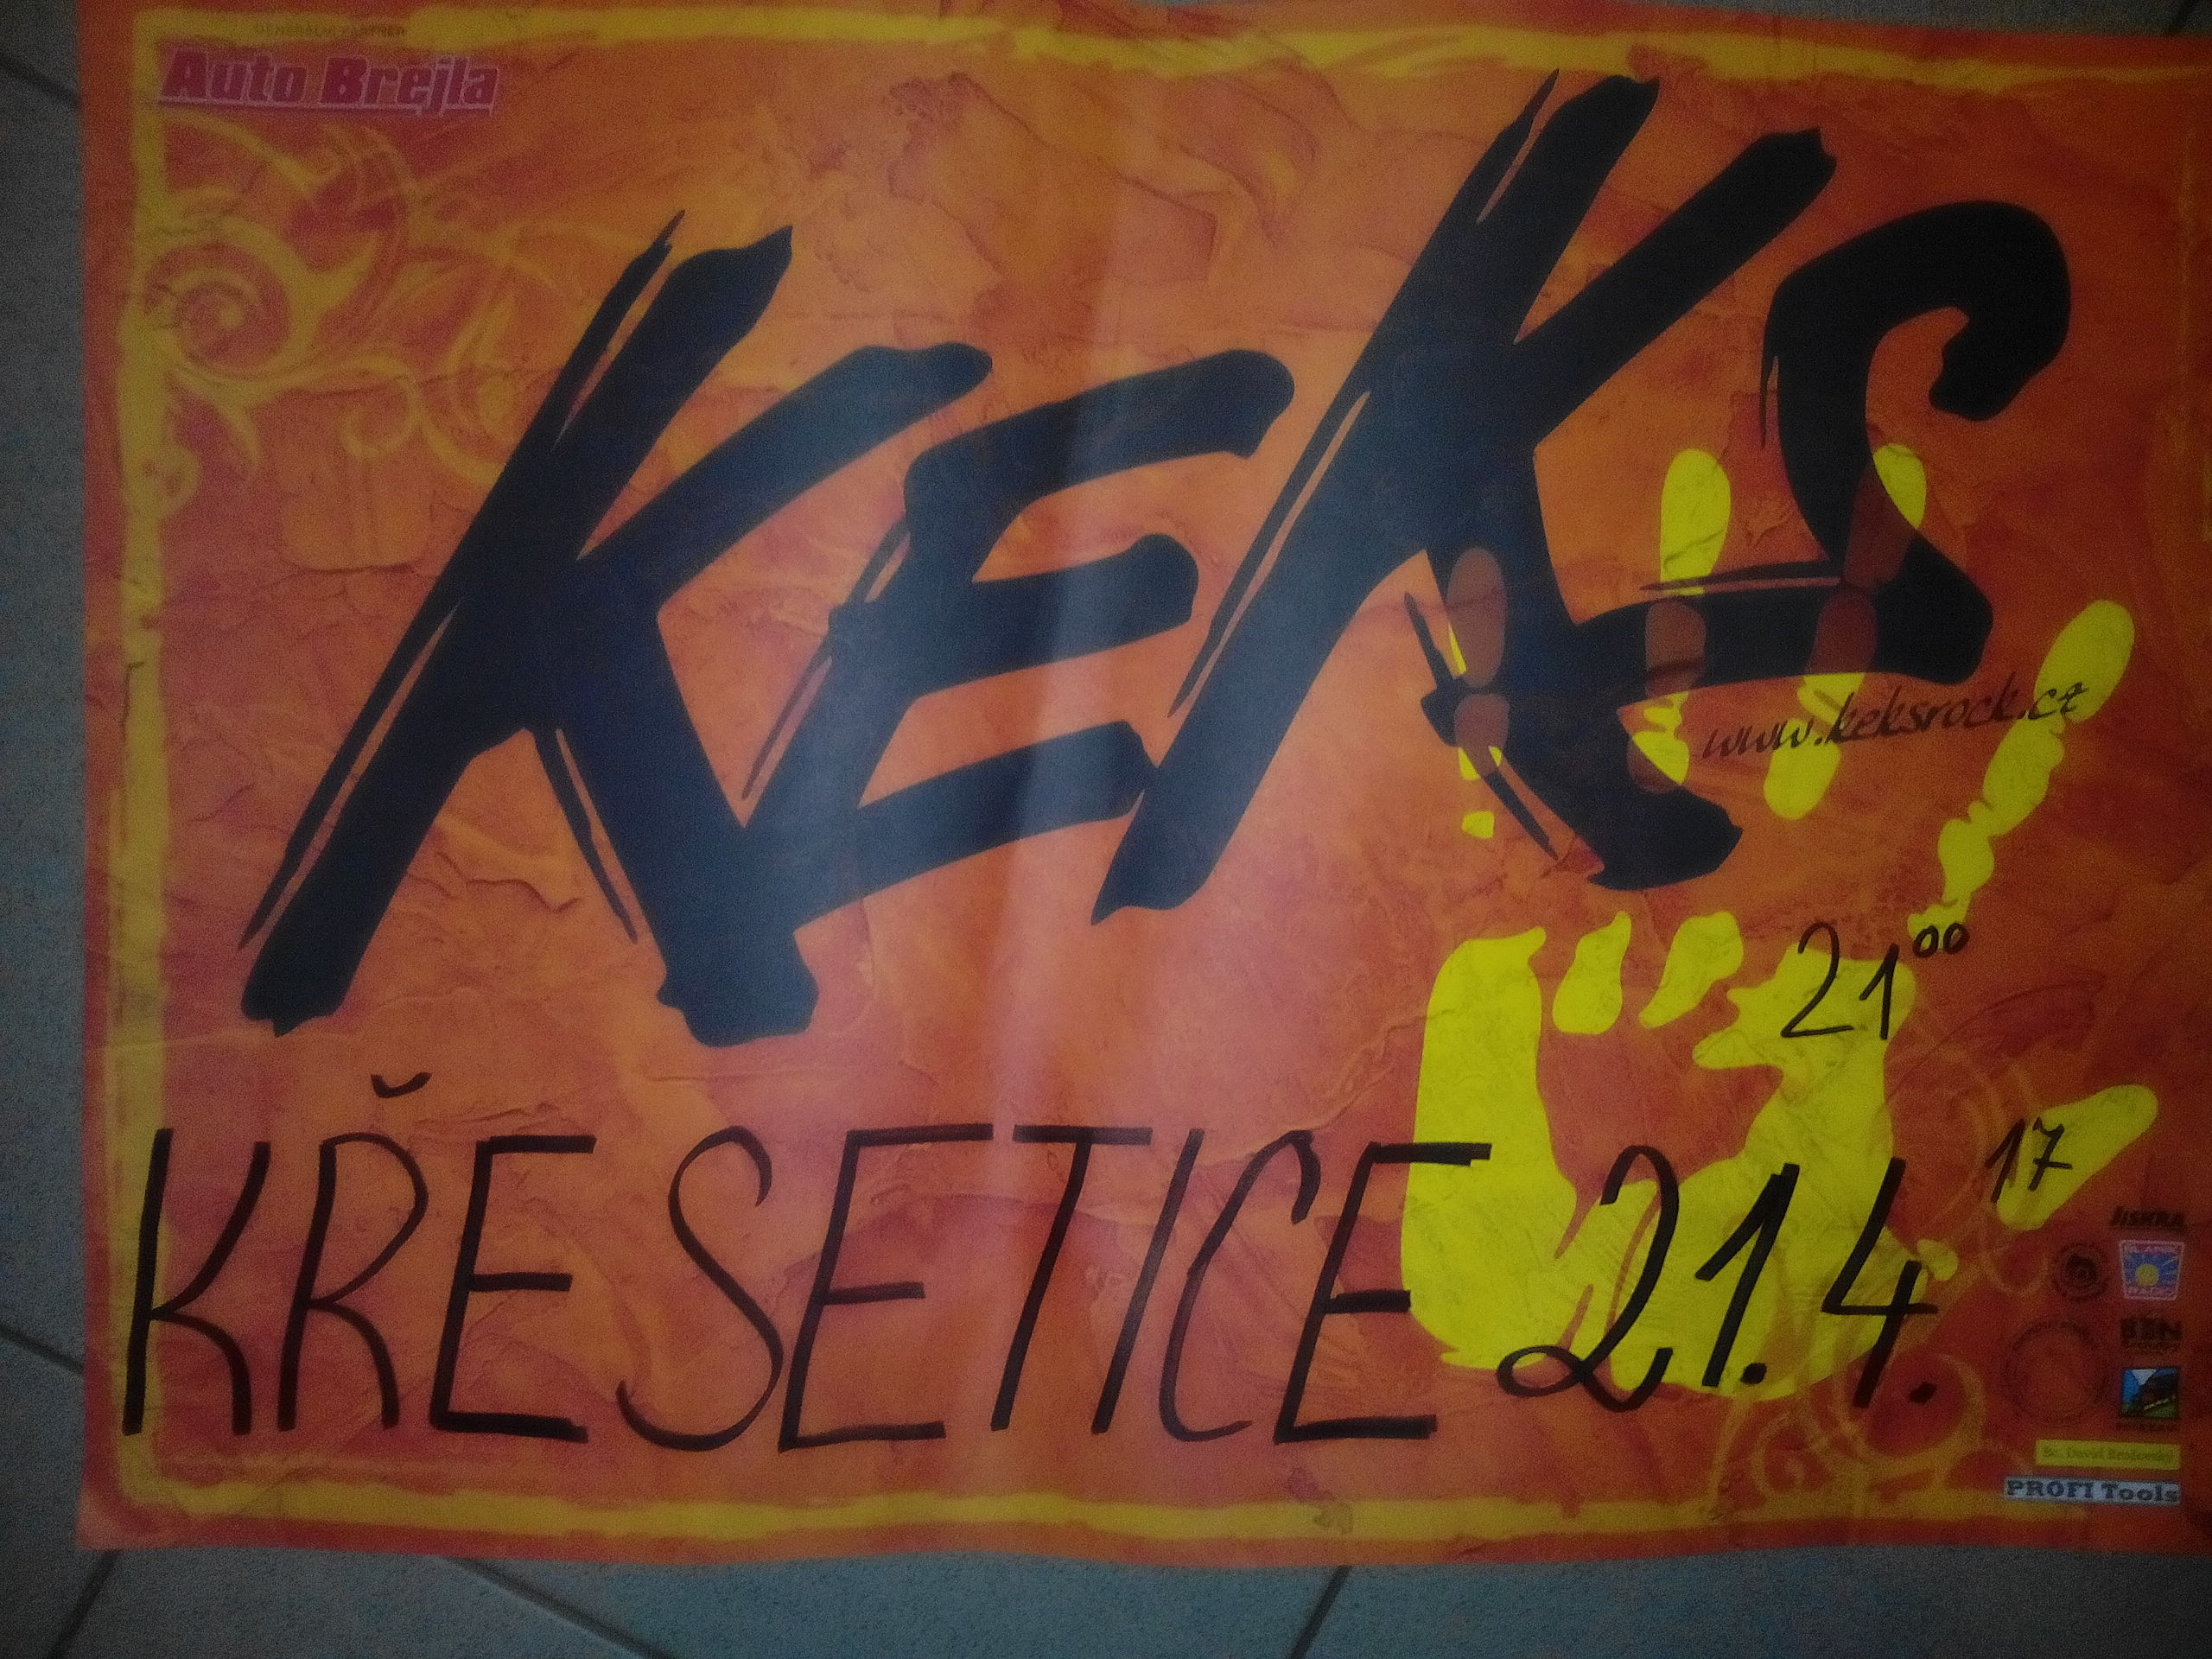 1757-keks-kresetice-21-4-2017.jpg